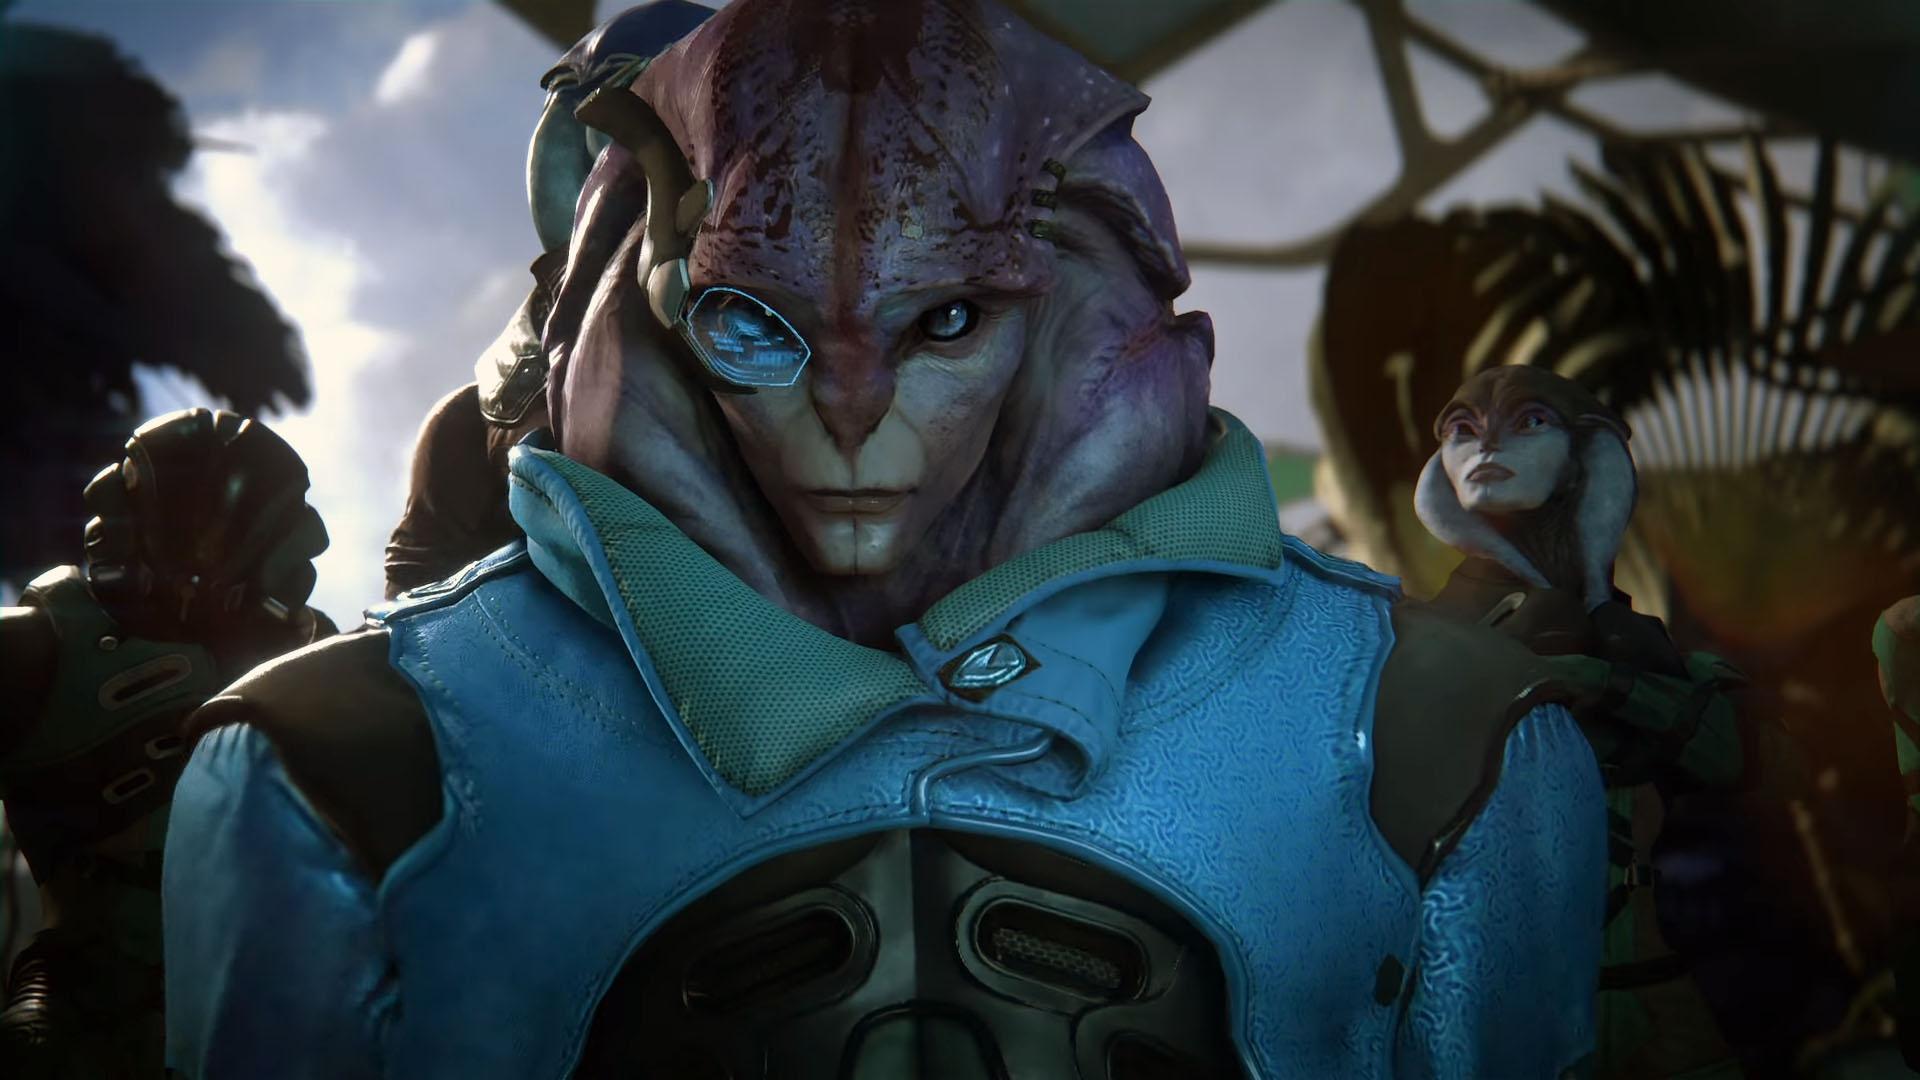 Jaal Ama Darav, Mass Effect Andromeda